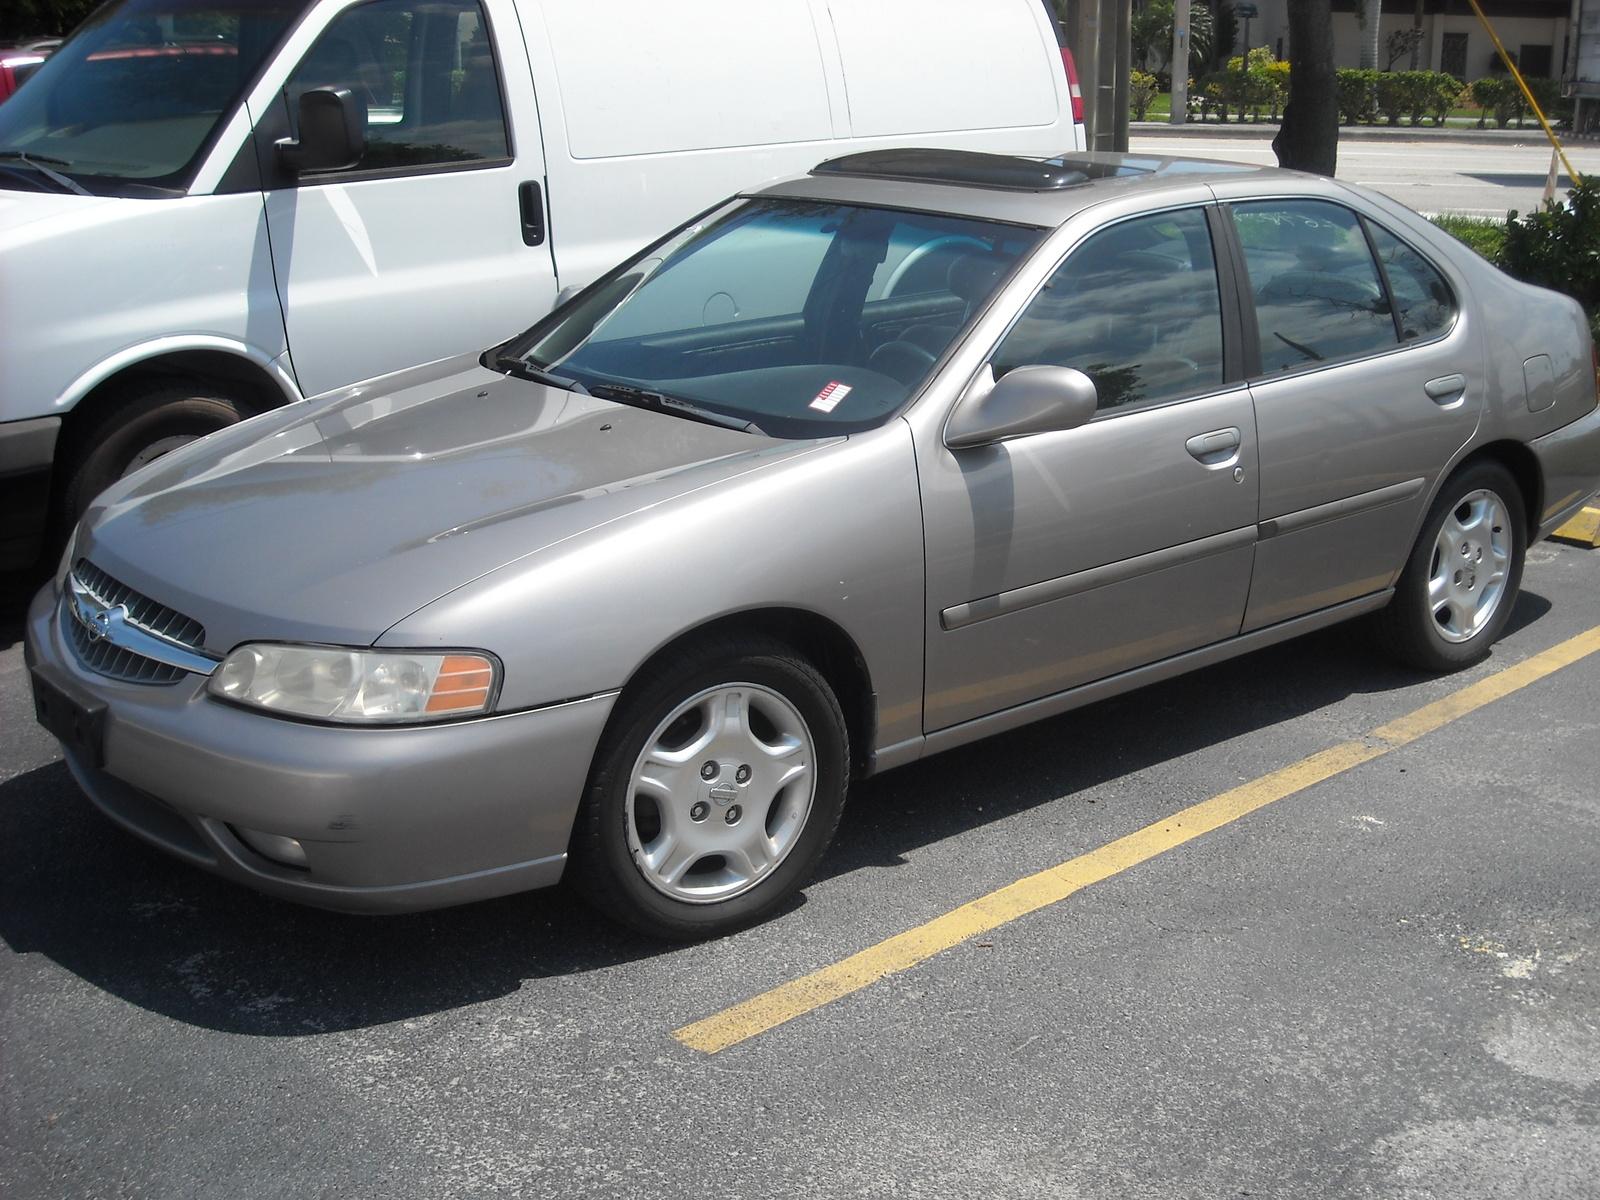 1997 Nissan Cefiro 2001 Nissan Altima - Pictures - CarGurus